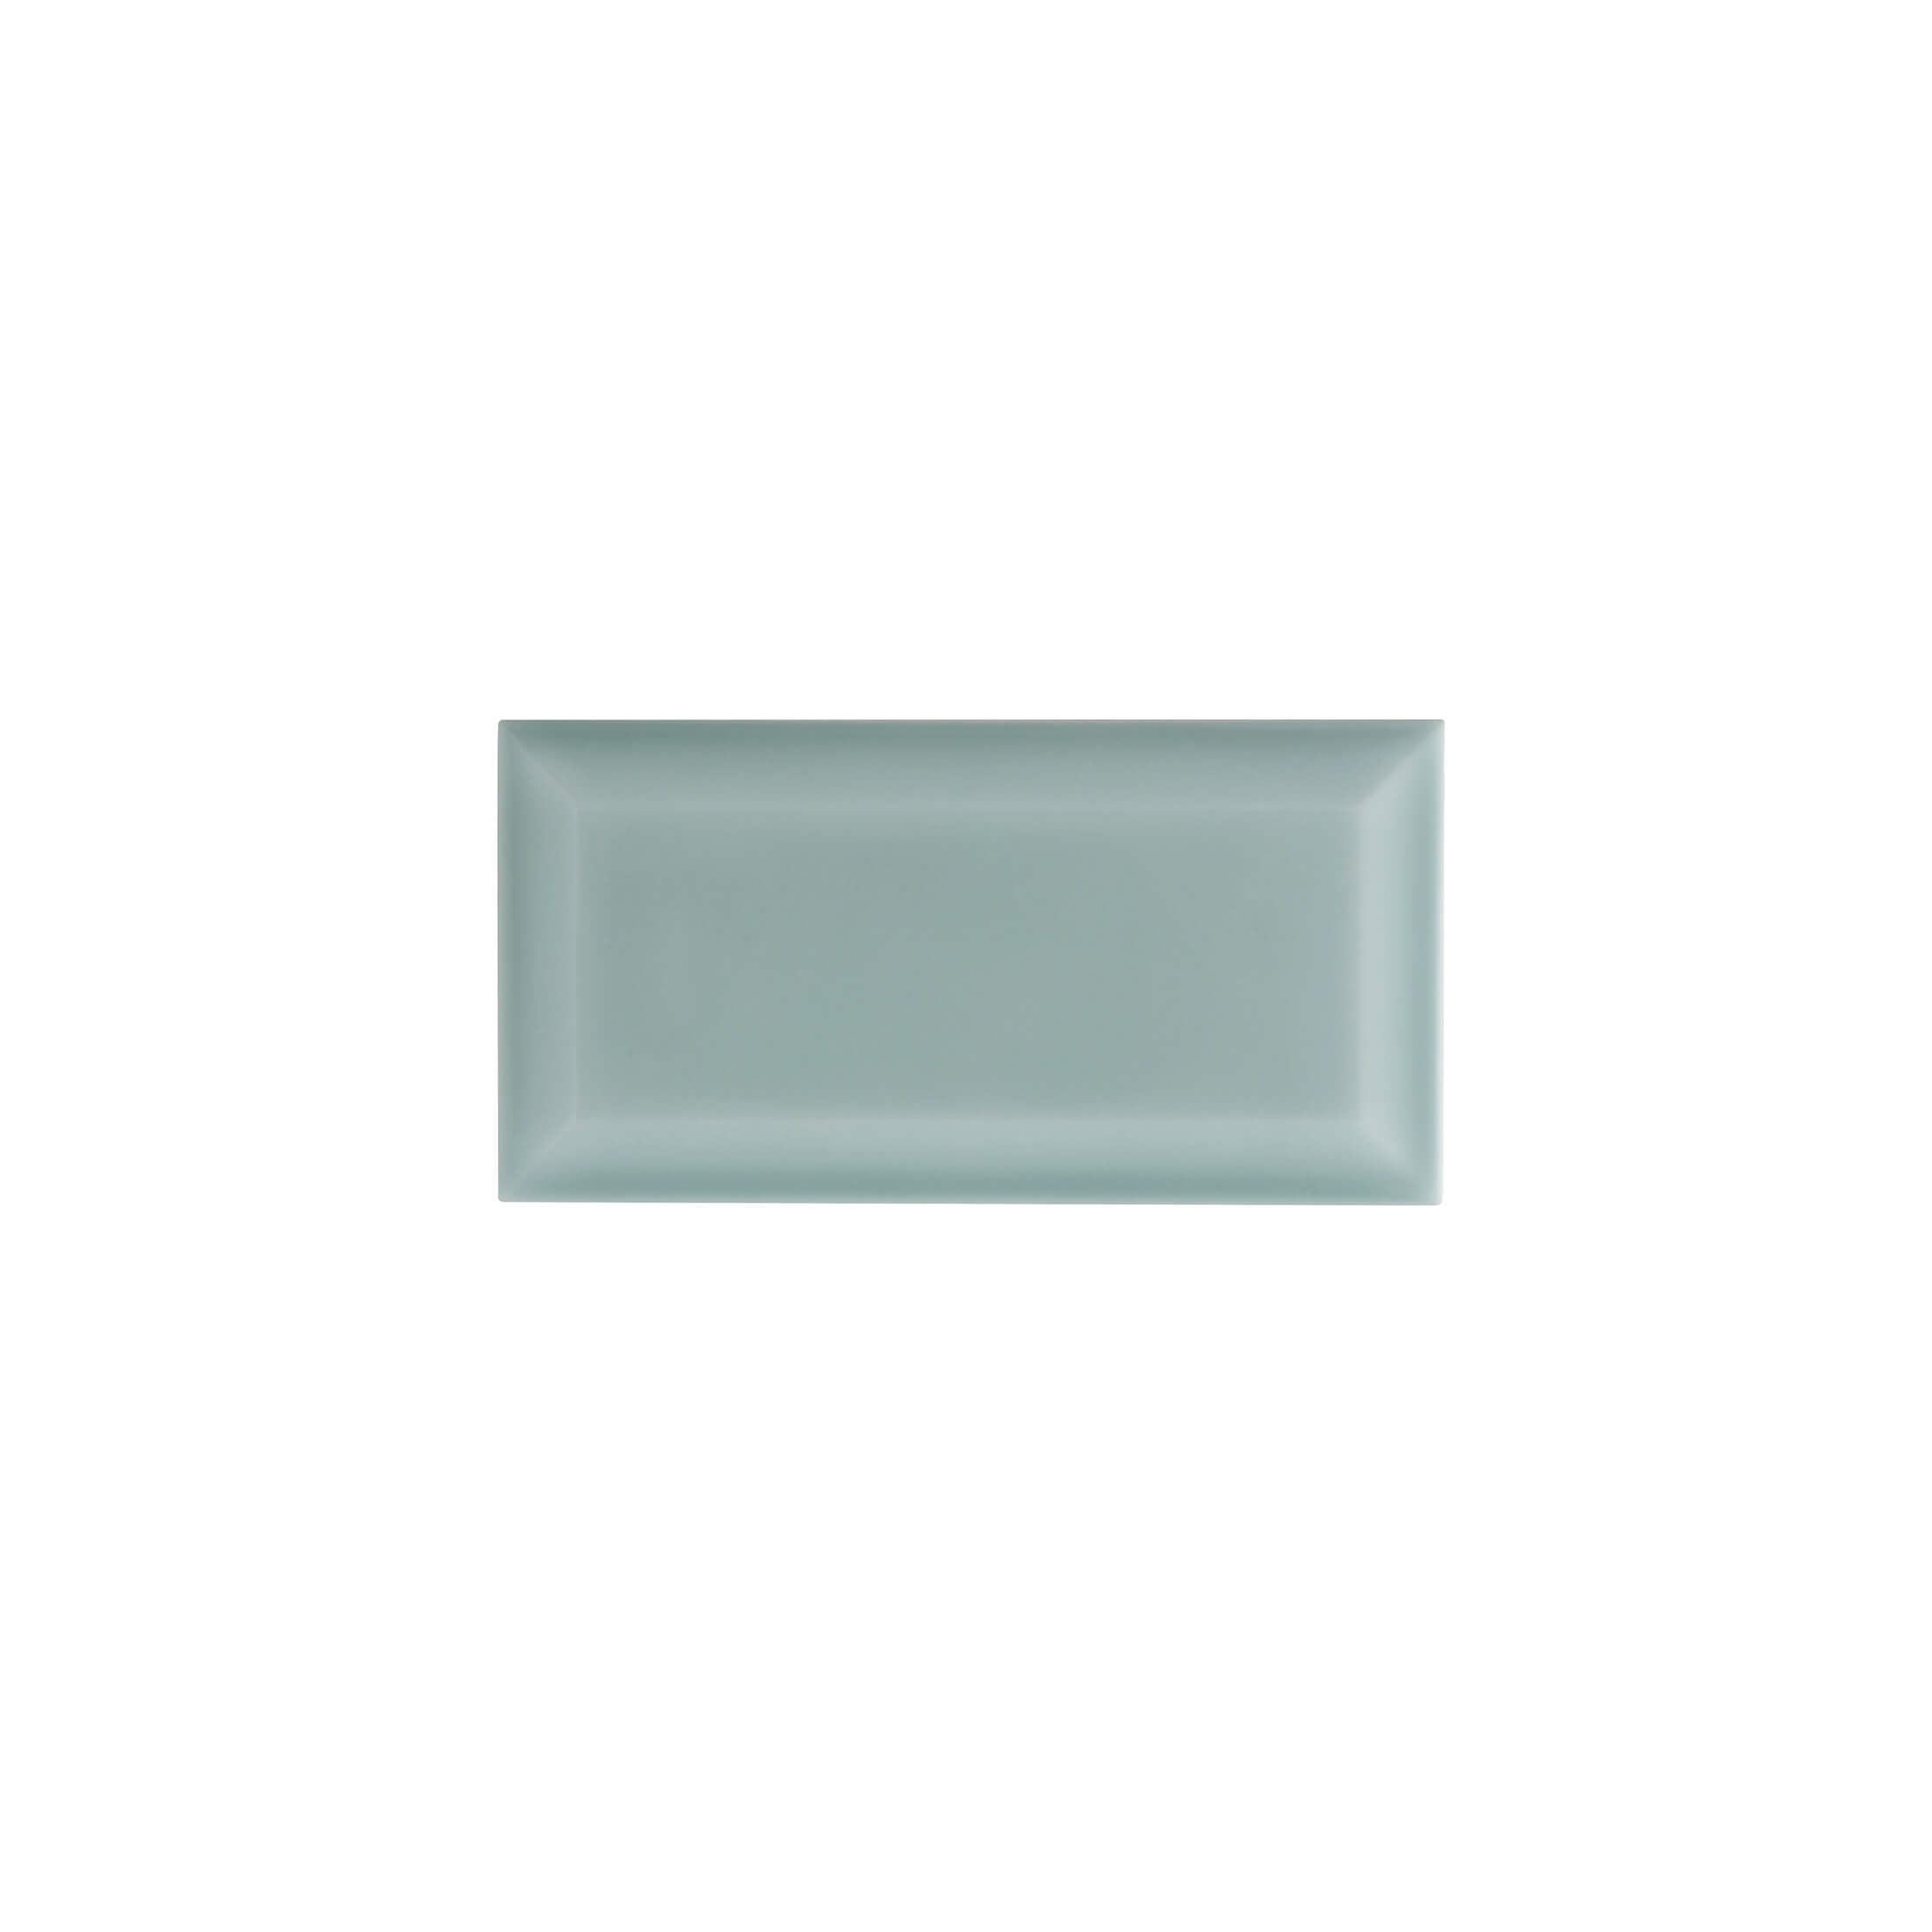 ADNE2056 - BISELADO PB - 7.5 cm X 15 cm